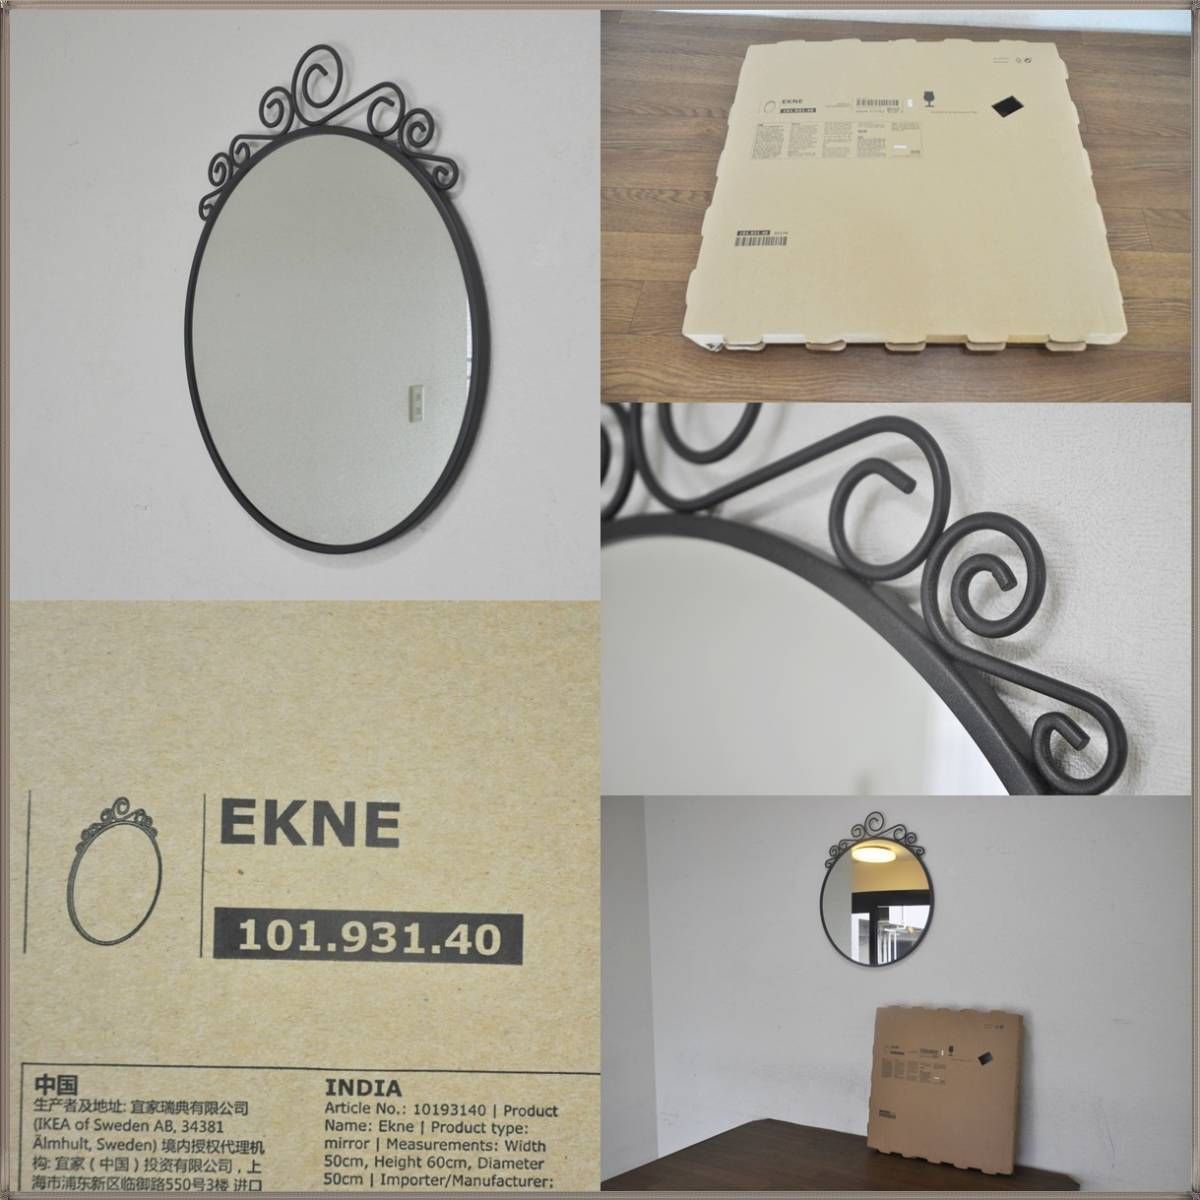 IKEA壁掛けミラーEbba Strandmark 100%無鉛コーティング鏡 EKNEデザイナー飛散防止フィルム貼り鏡イケア 新品・未使用_画像7